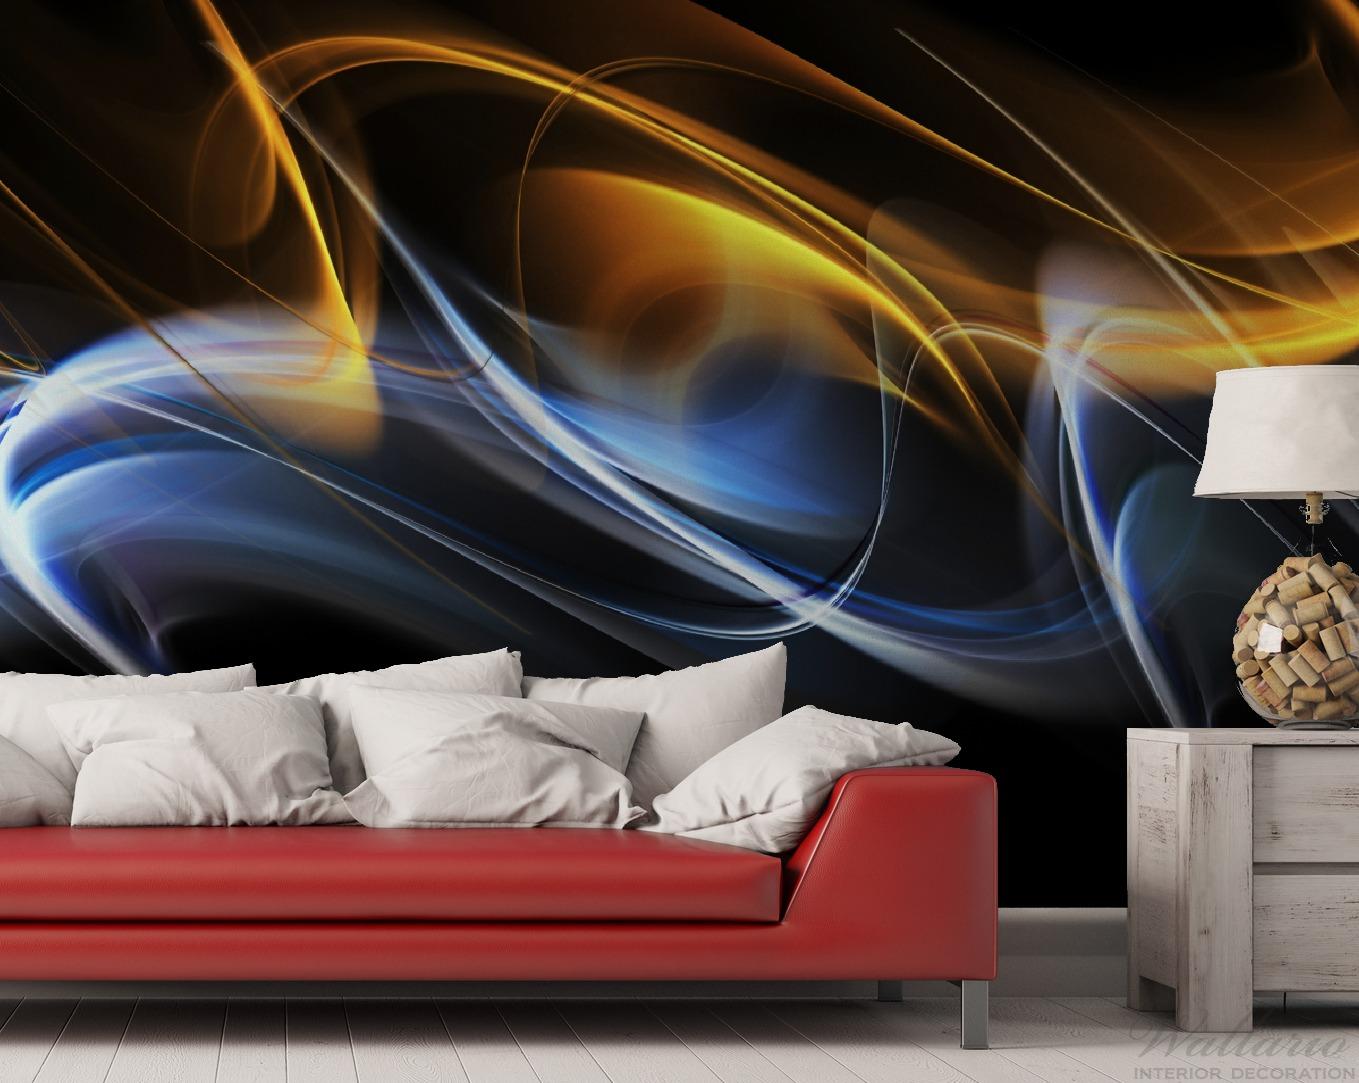 Vliestapete Abstraktes Design – Bild 2